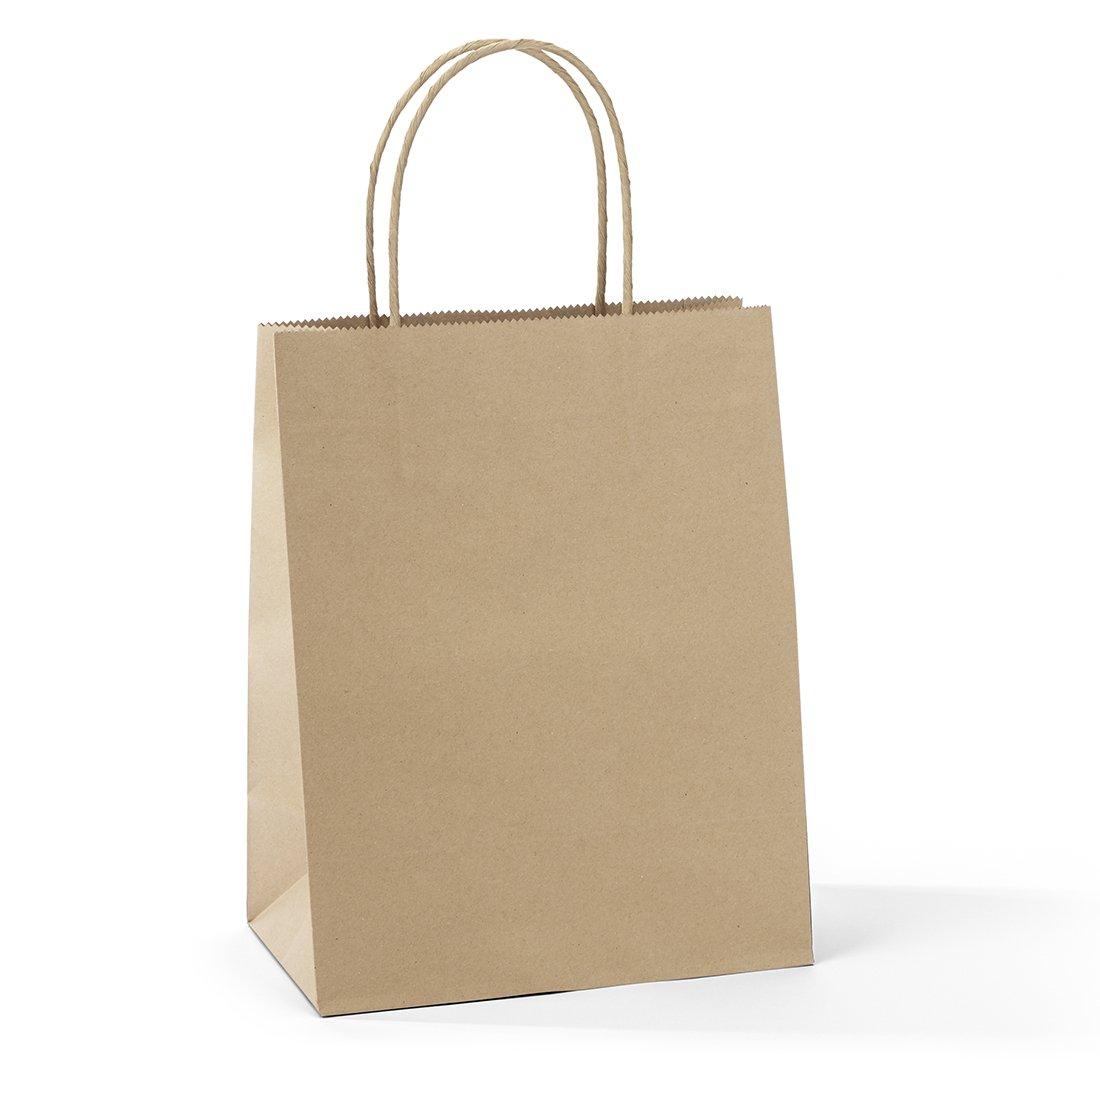 Halulu 25 Pcs 8x4.75x10.5'' Kraft Brown Paper Handle Shopping Gift Merchandise Carry Retail Bags